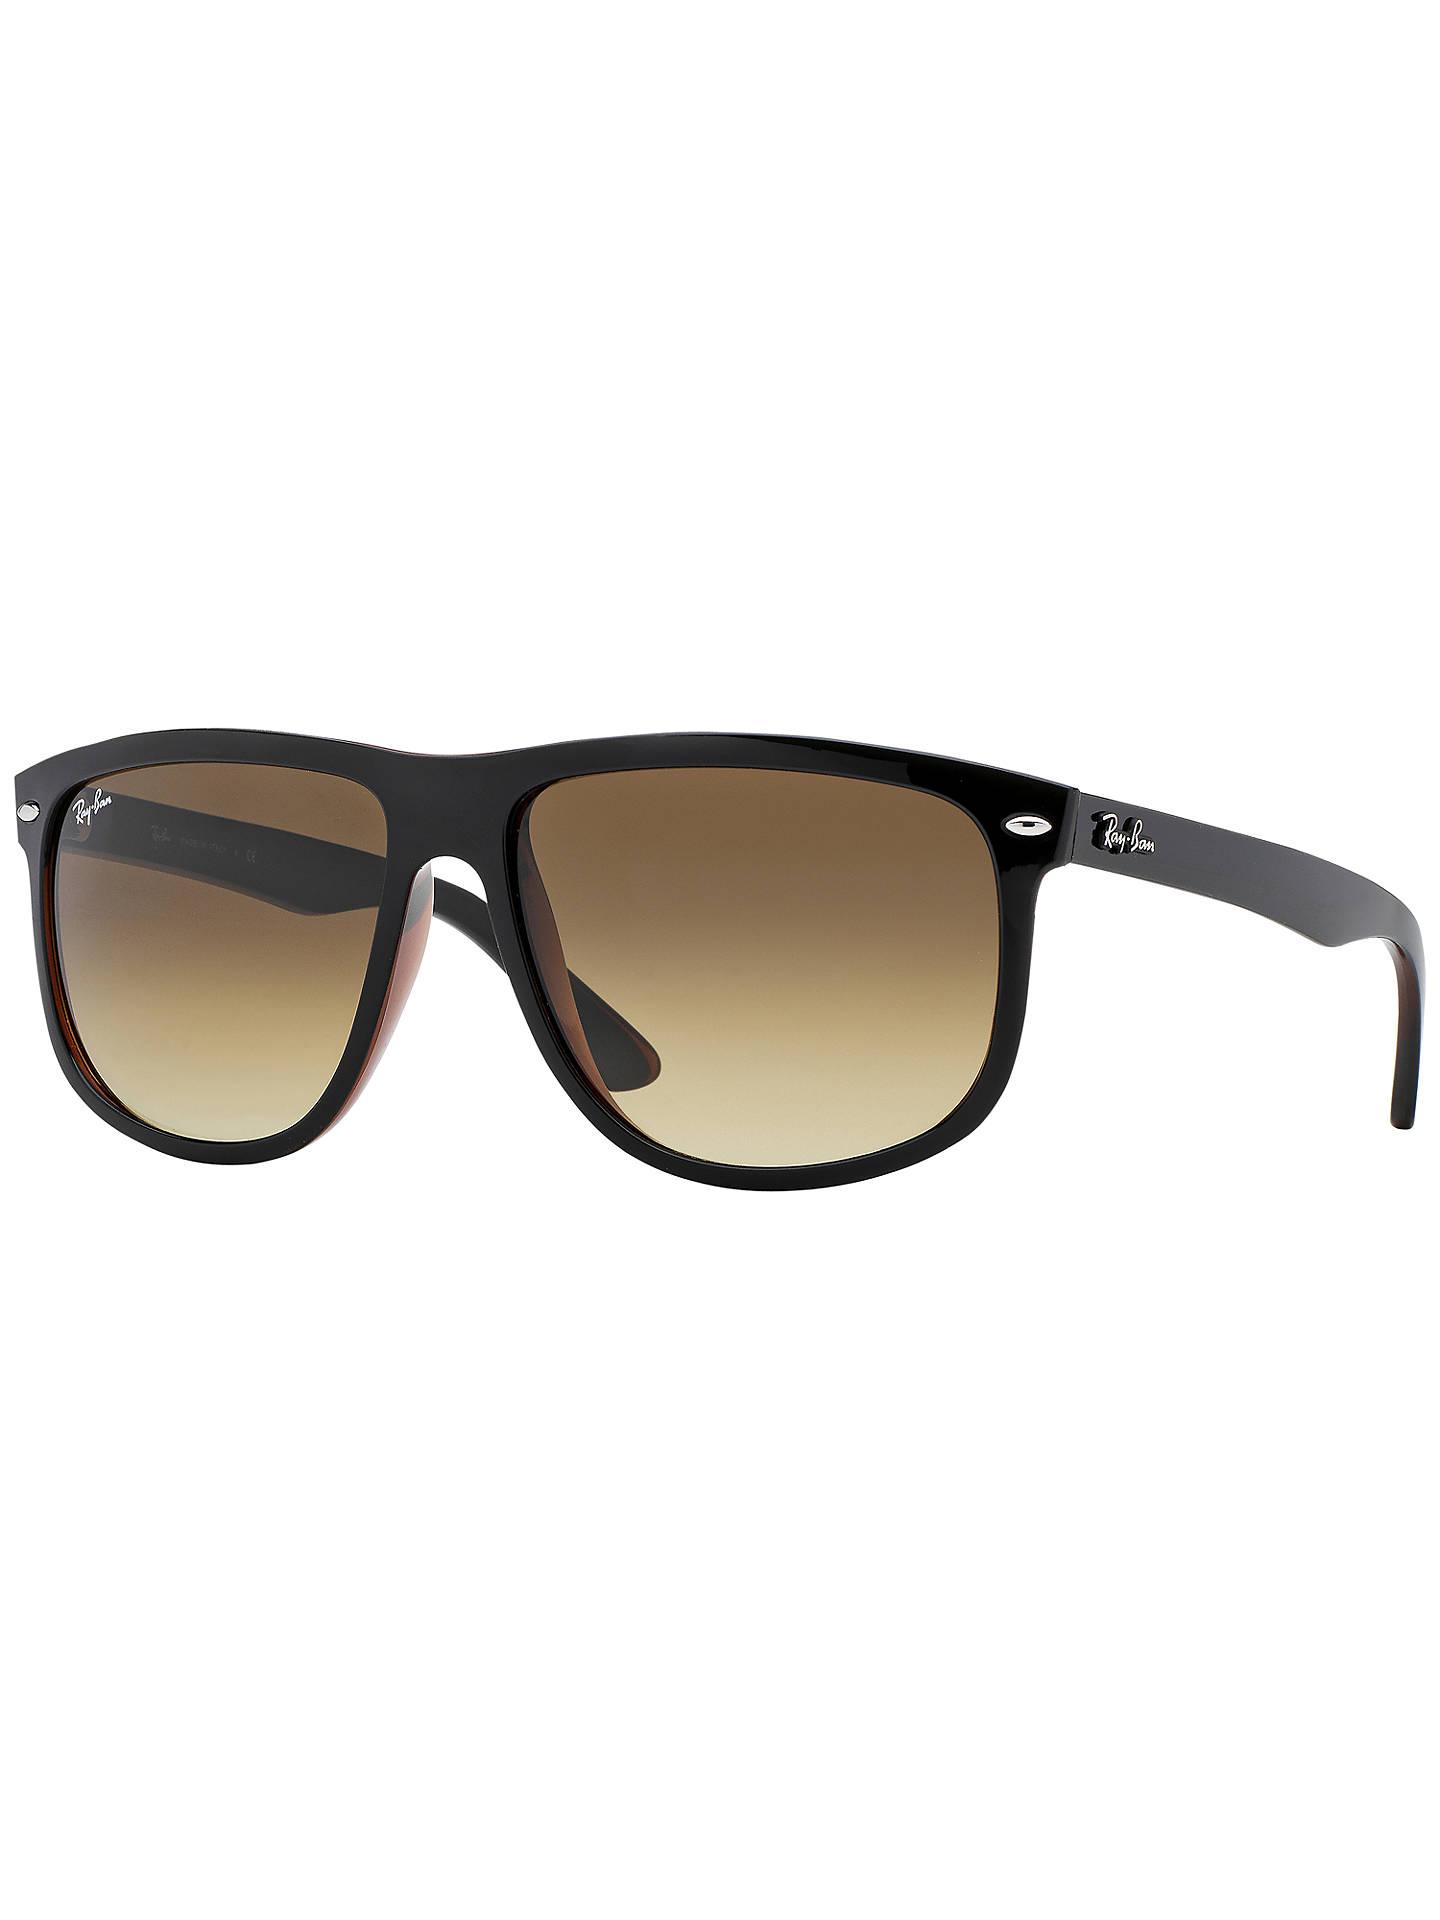 982b468f790 Ray-Ban RB4147 Square Sunglasses at John Lewis   Partners